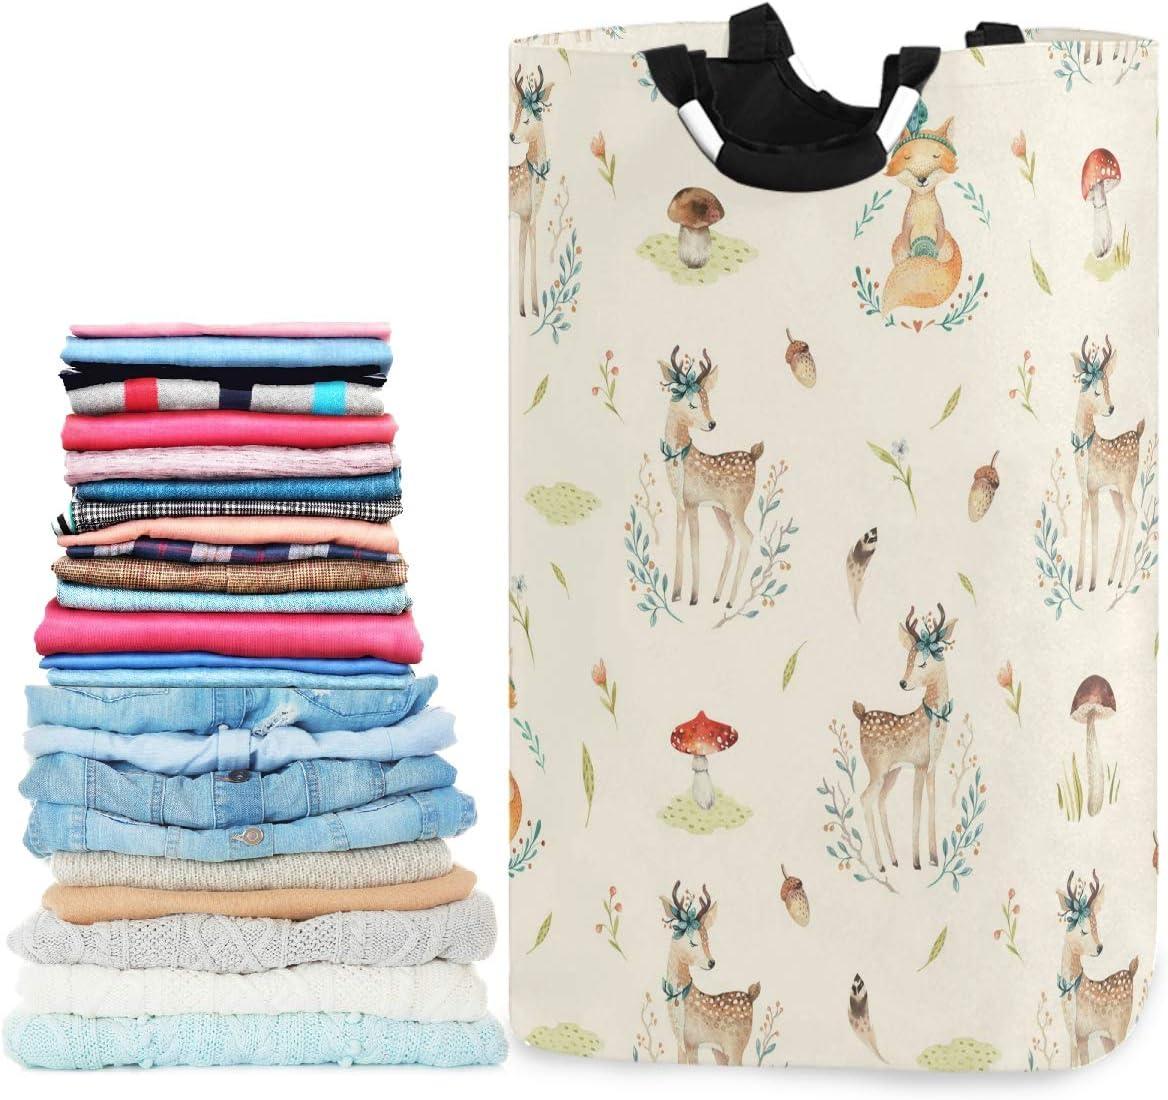 visesunny Cute Baby Foxes and Deer Animal Large Capacity Laundry Hamper Basket Water-Resistant Oxford Cloth Storage Baskets for Bedroom, Bathroom, Dorm, Kids Room